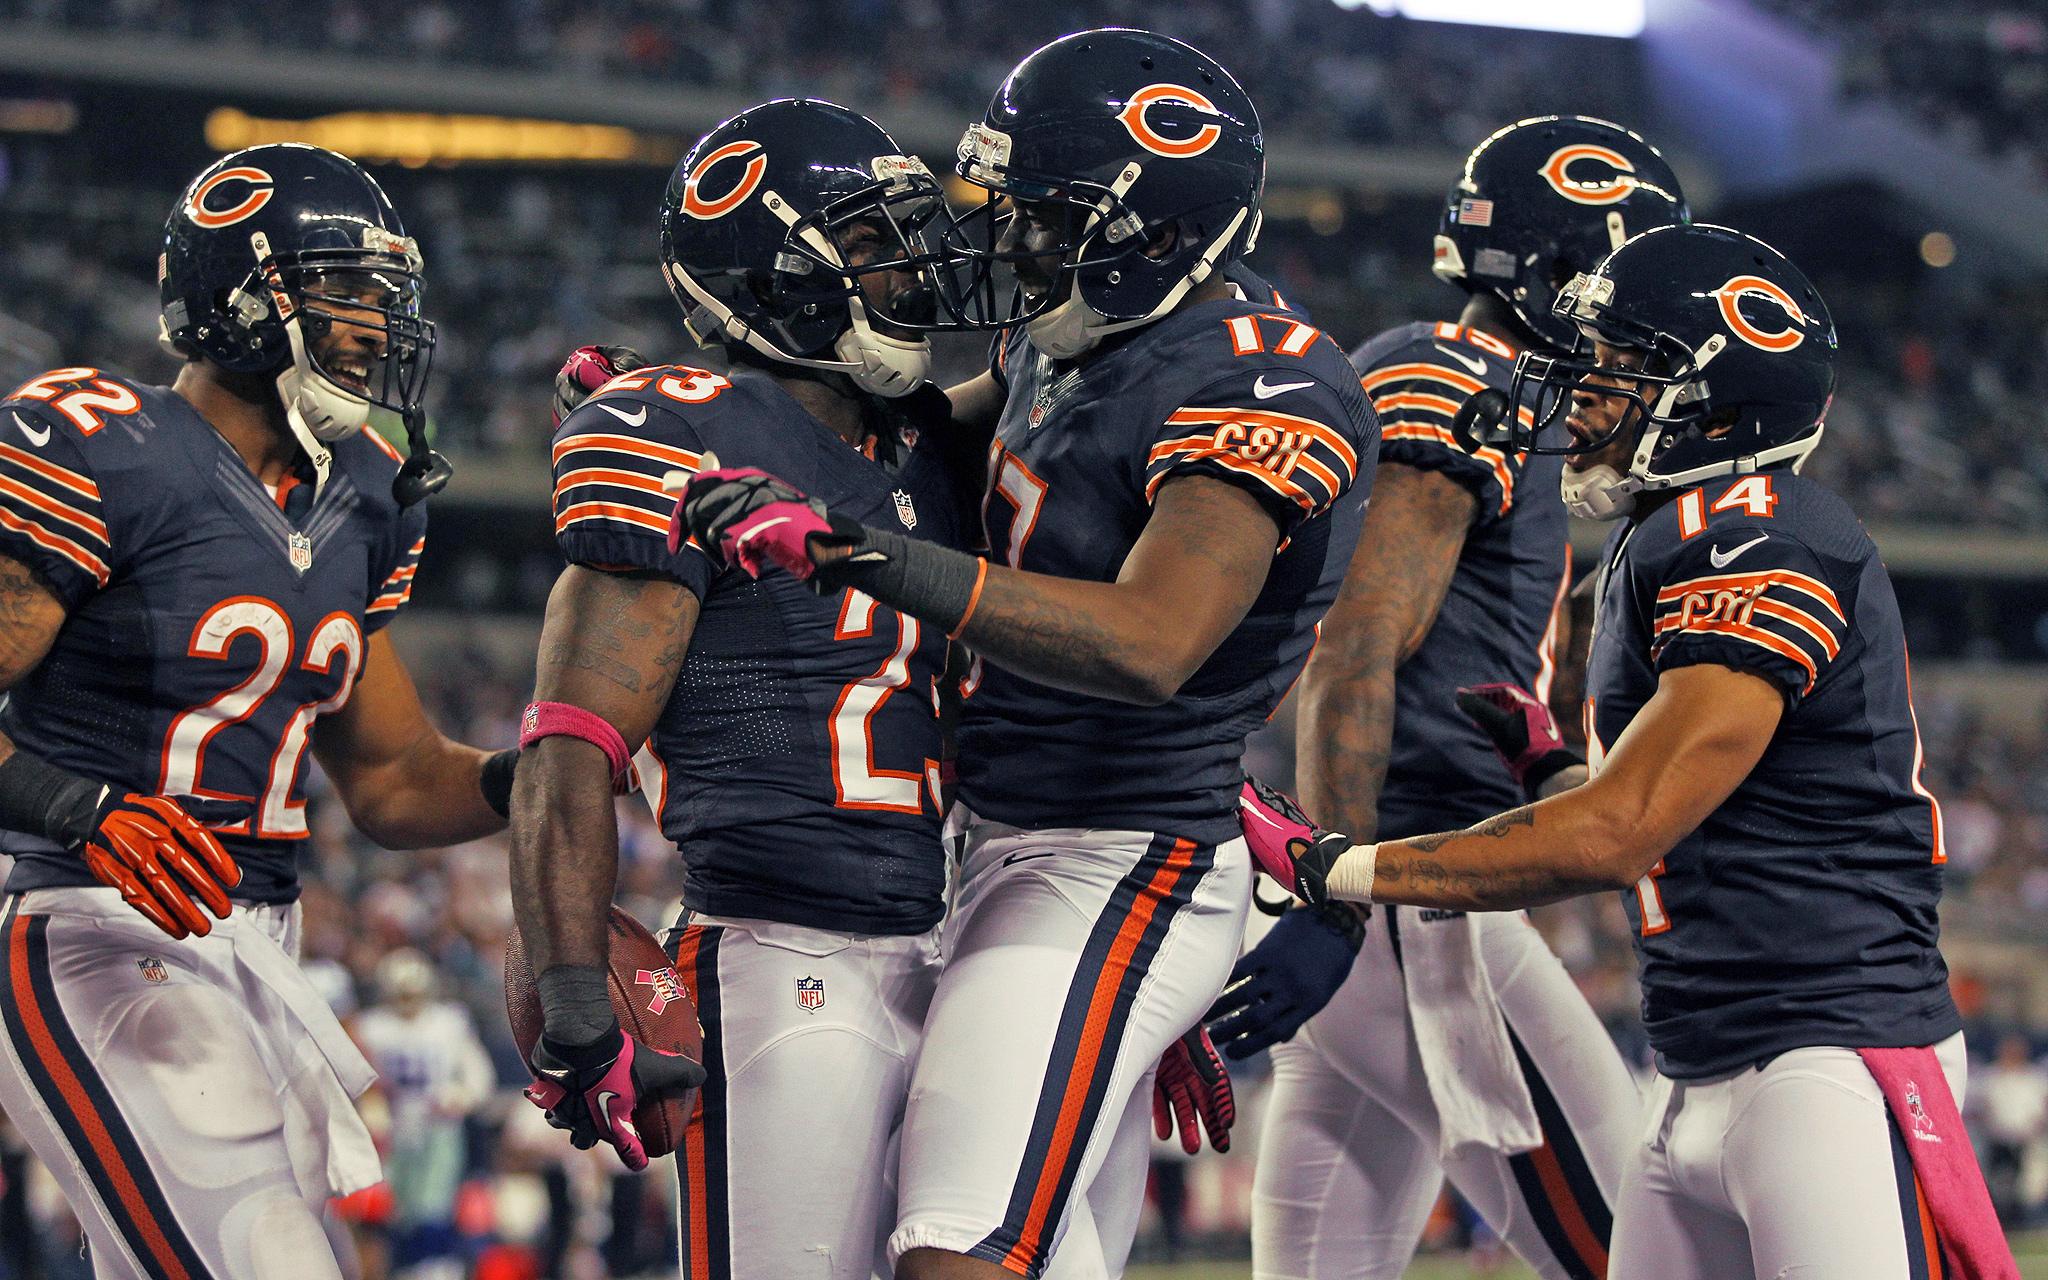 Bears Celebrate